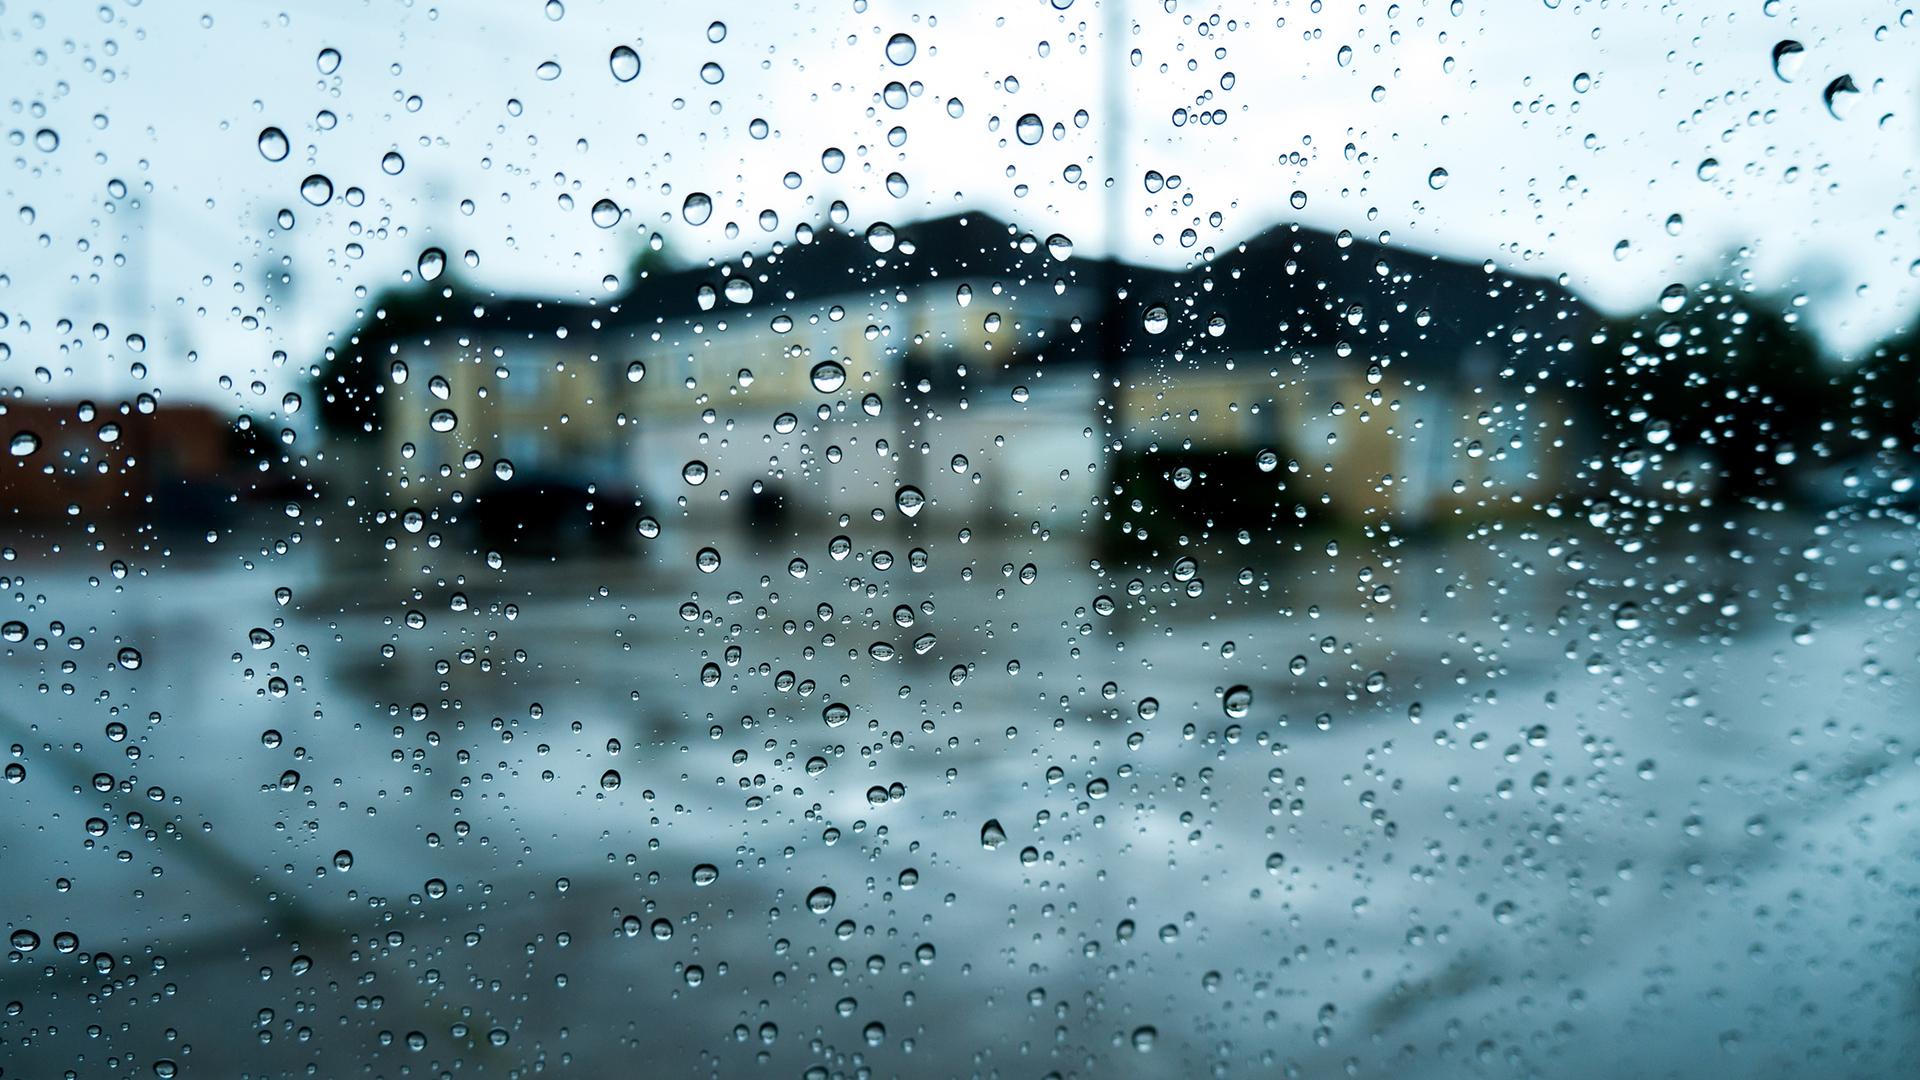 Rain Wallpaper; Rain Wallpaper; Rain Wallpaper ...